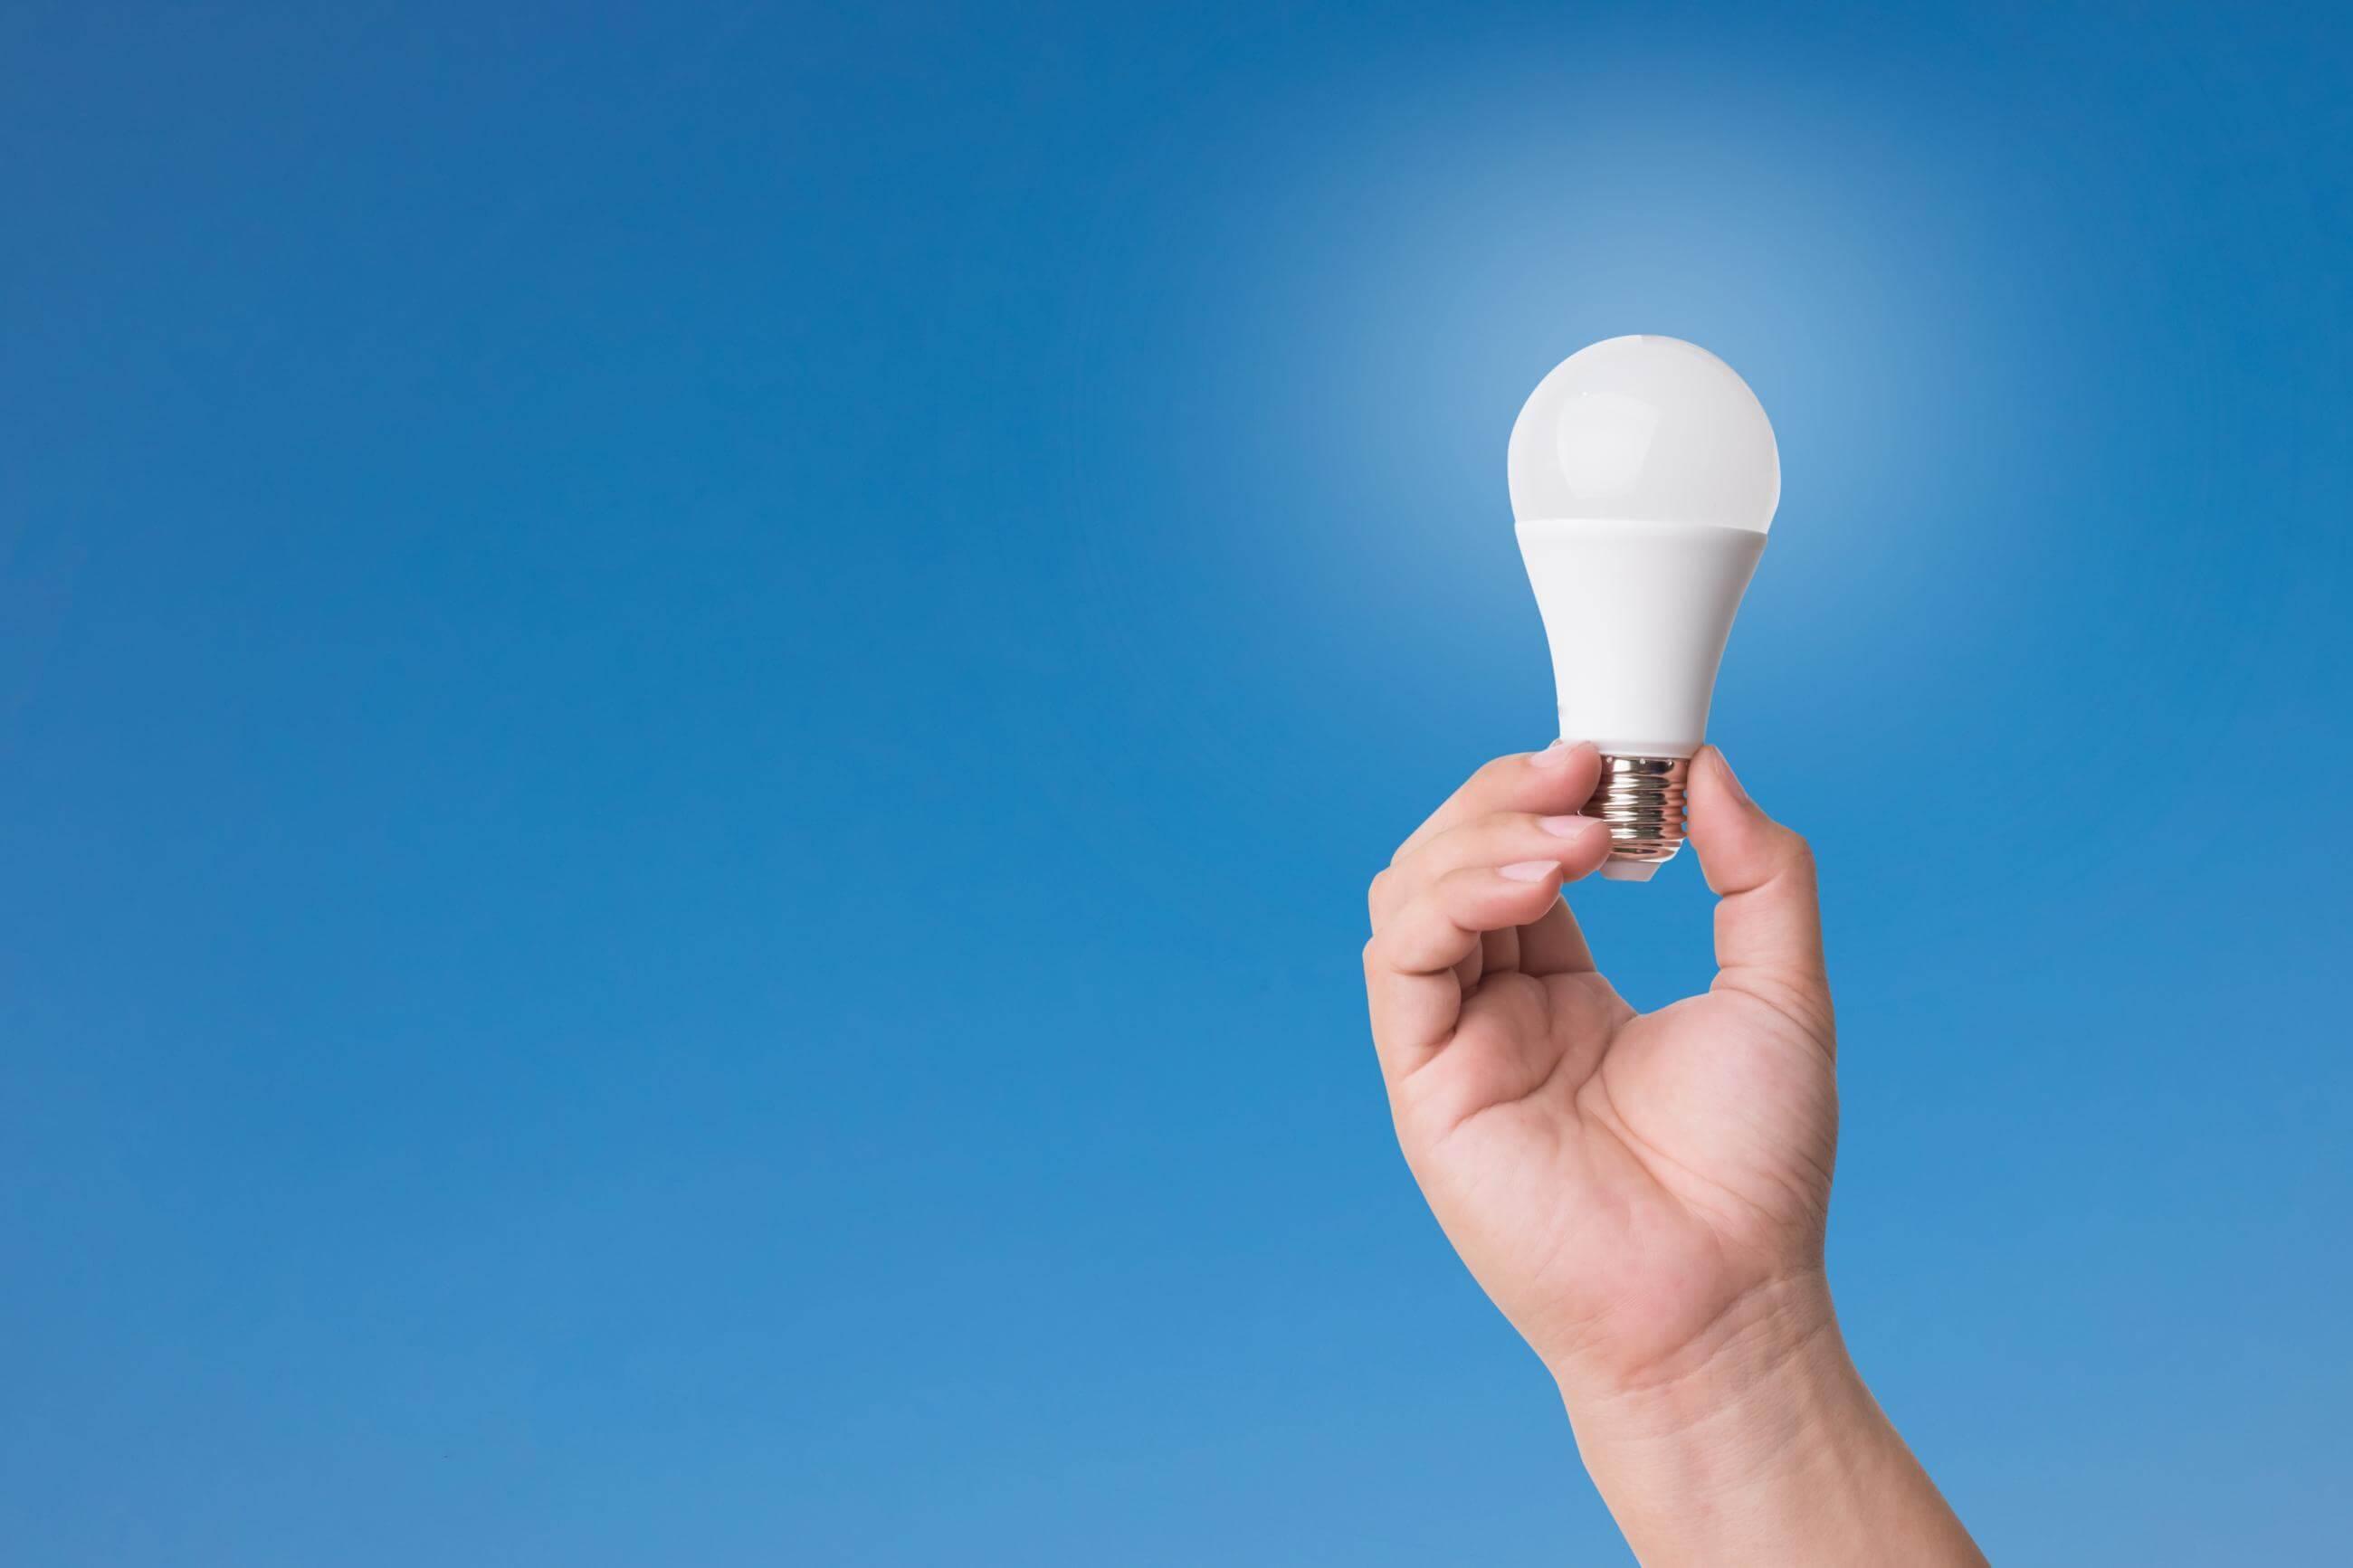 DOE energy-efficient light bulb